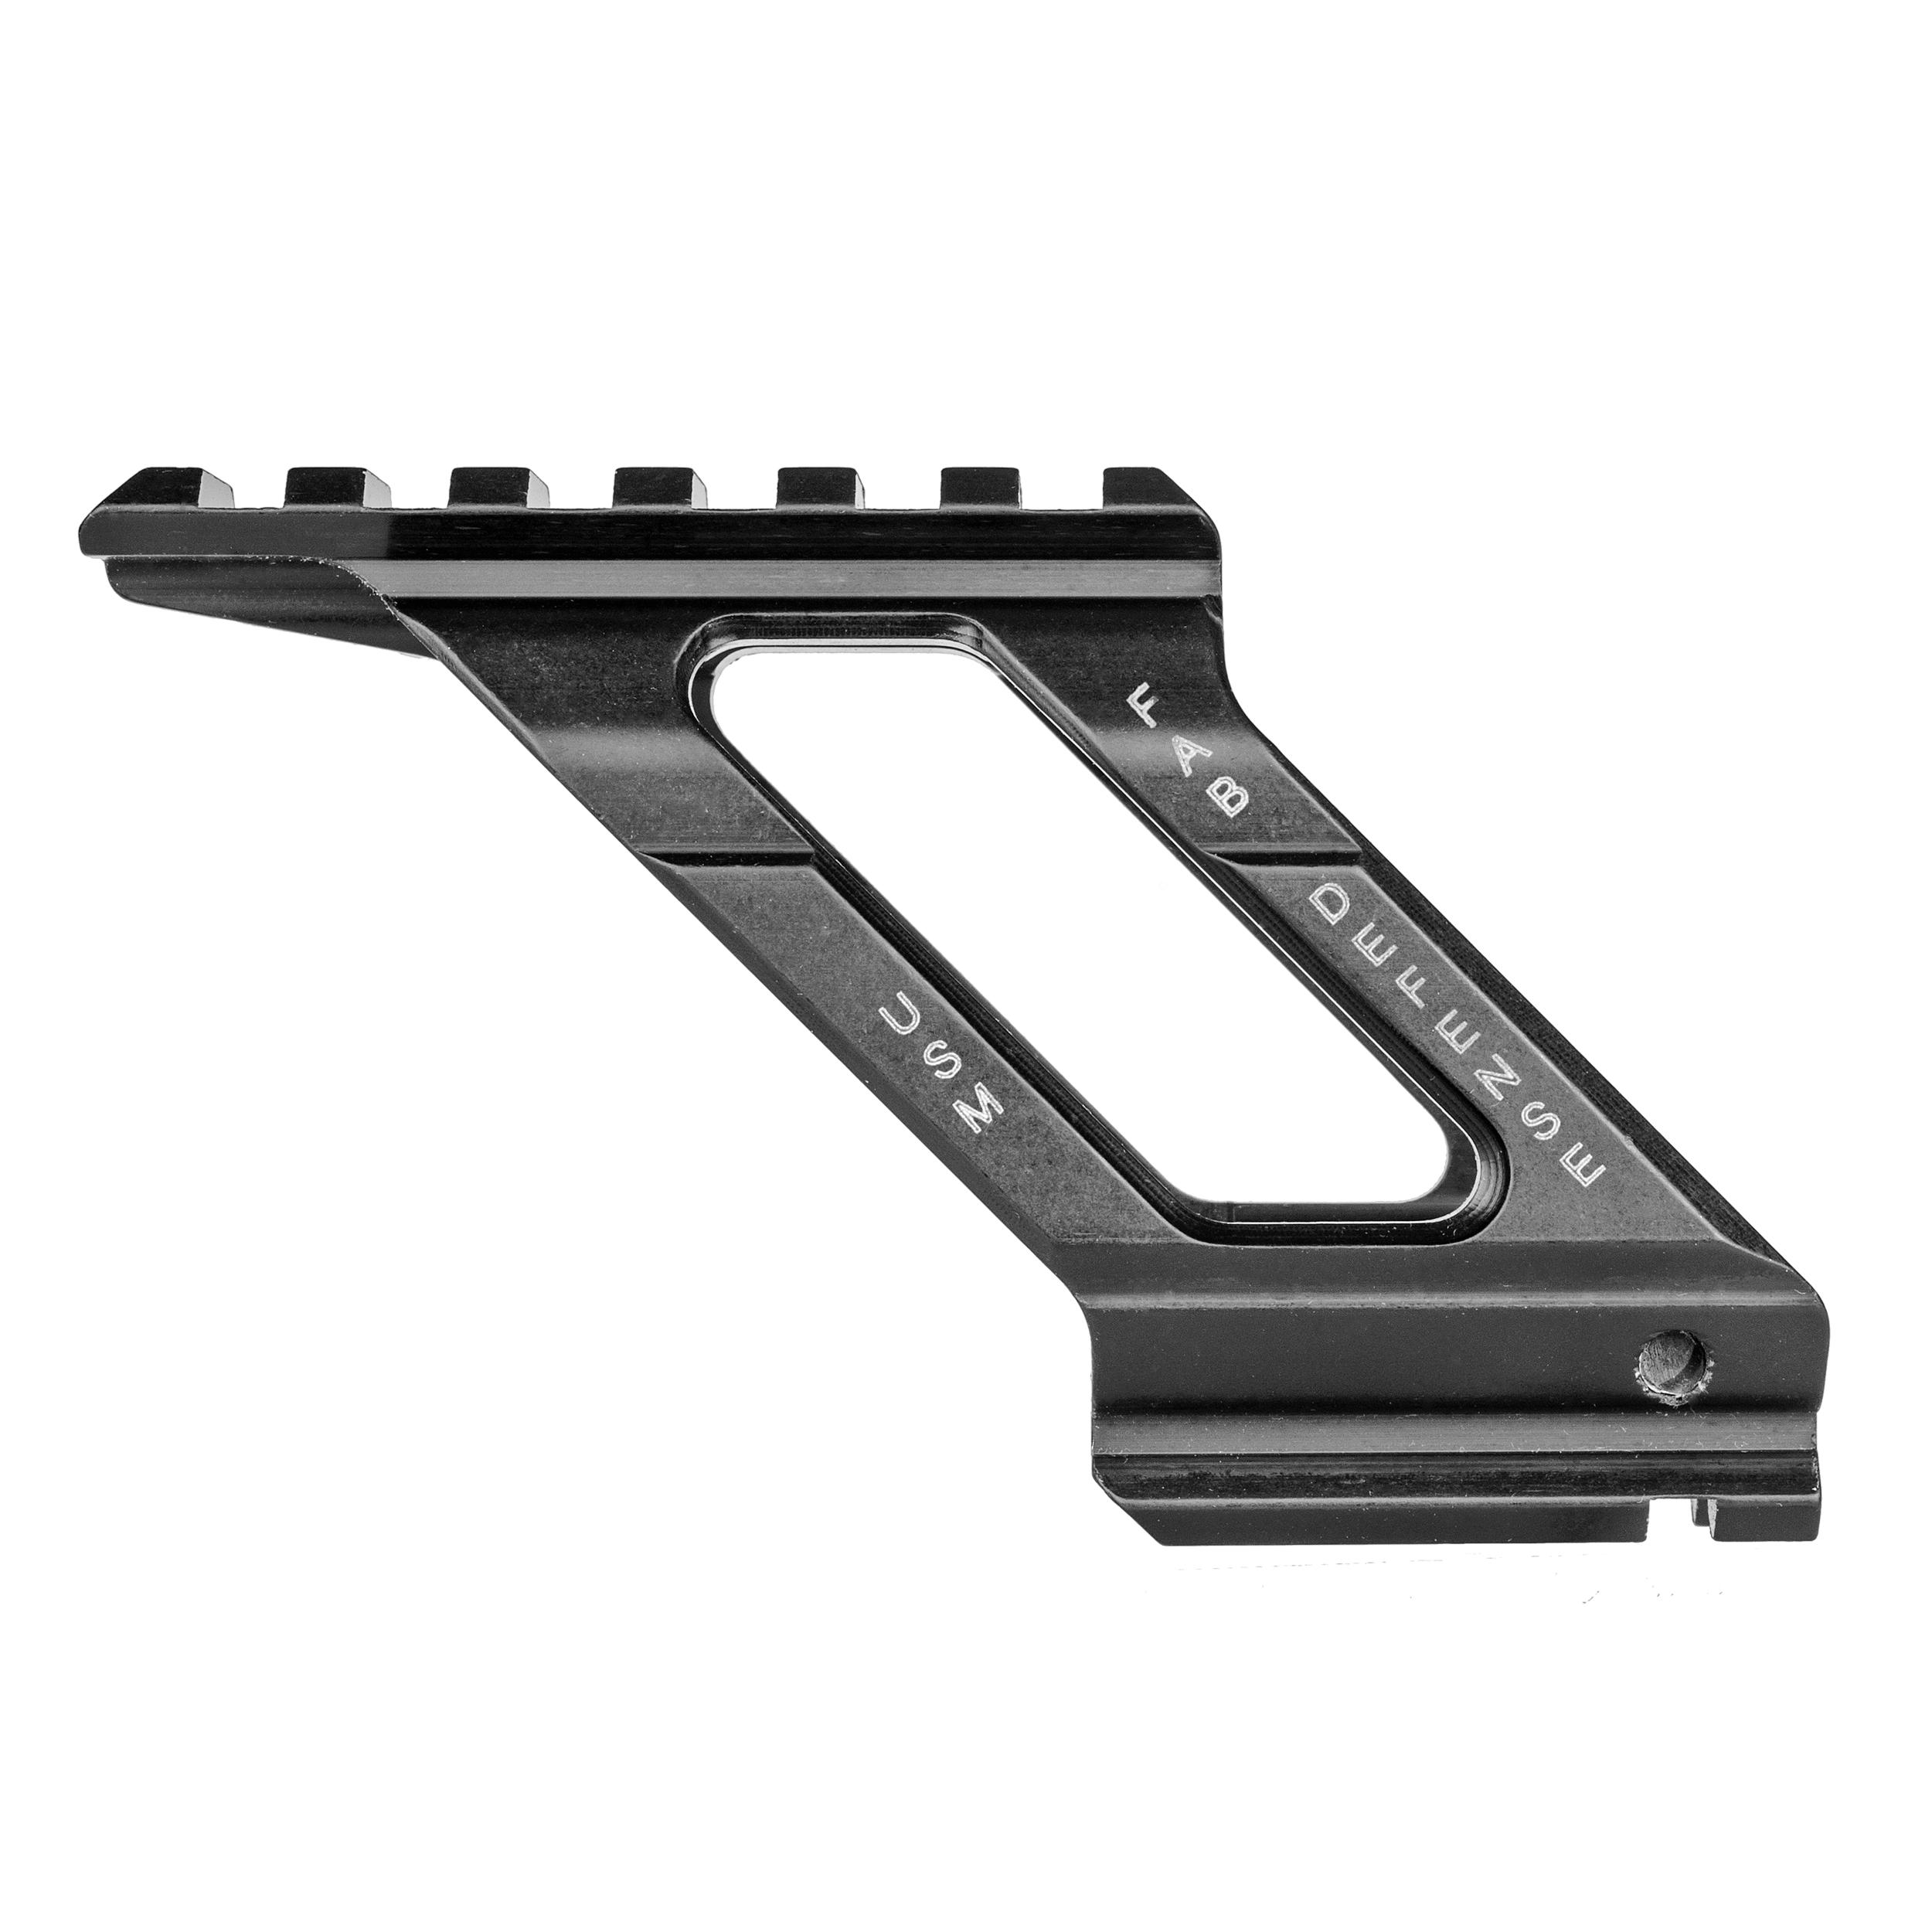 Universal Handgun Scope Mount